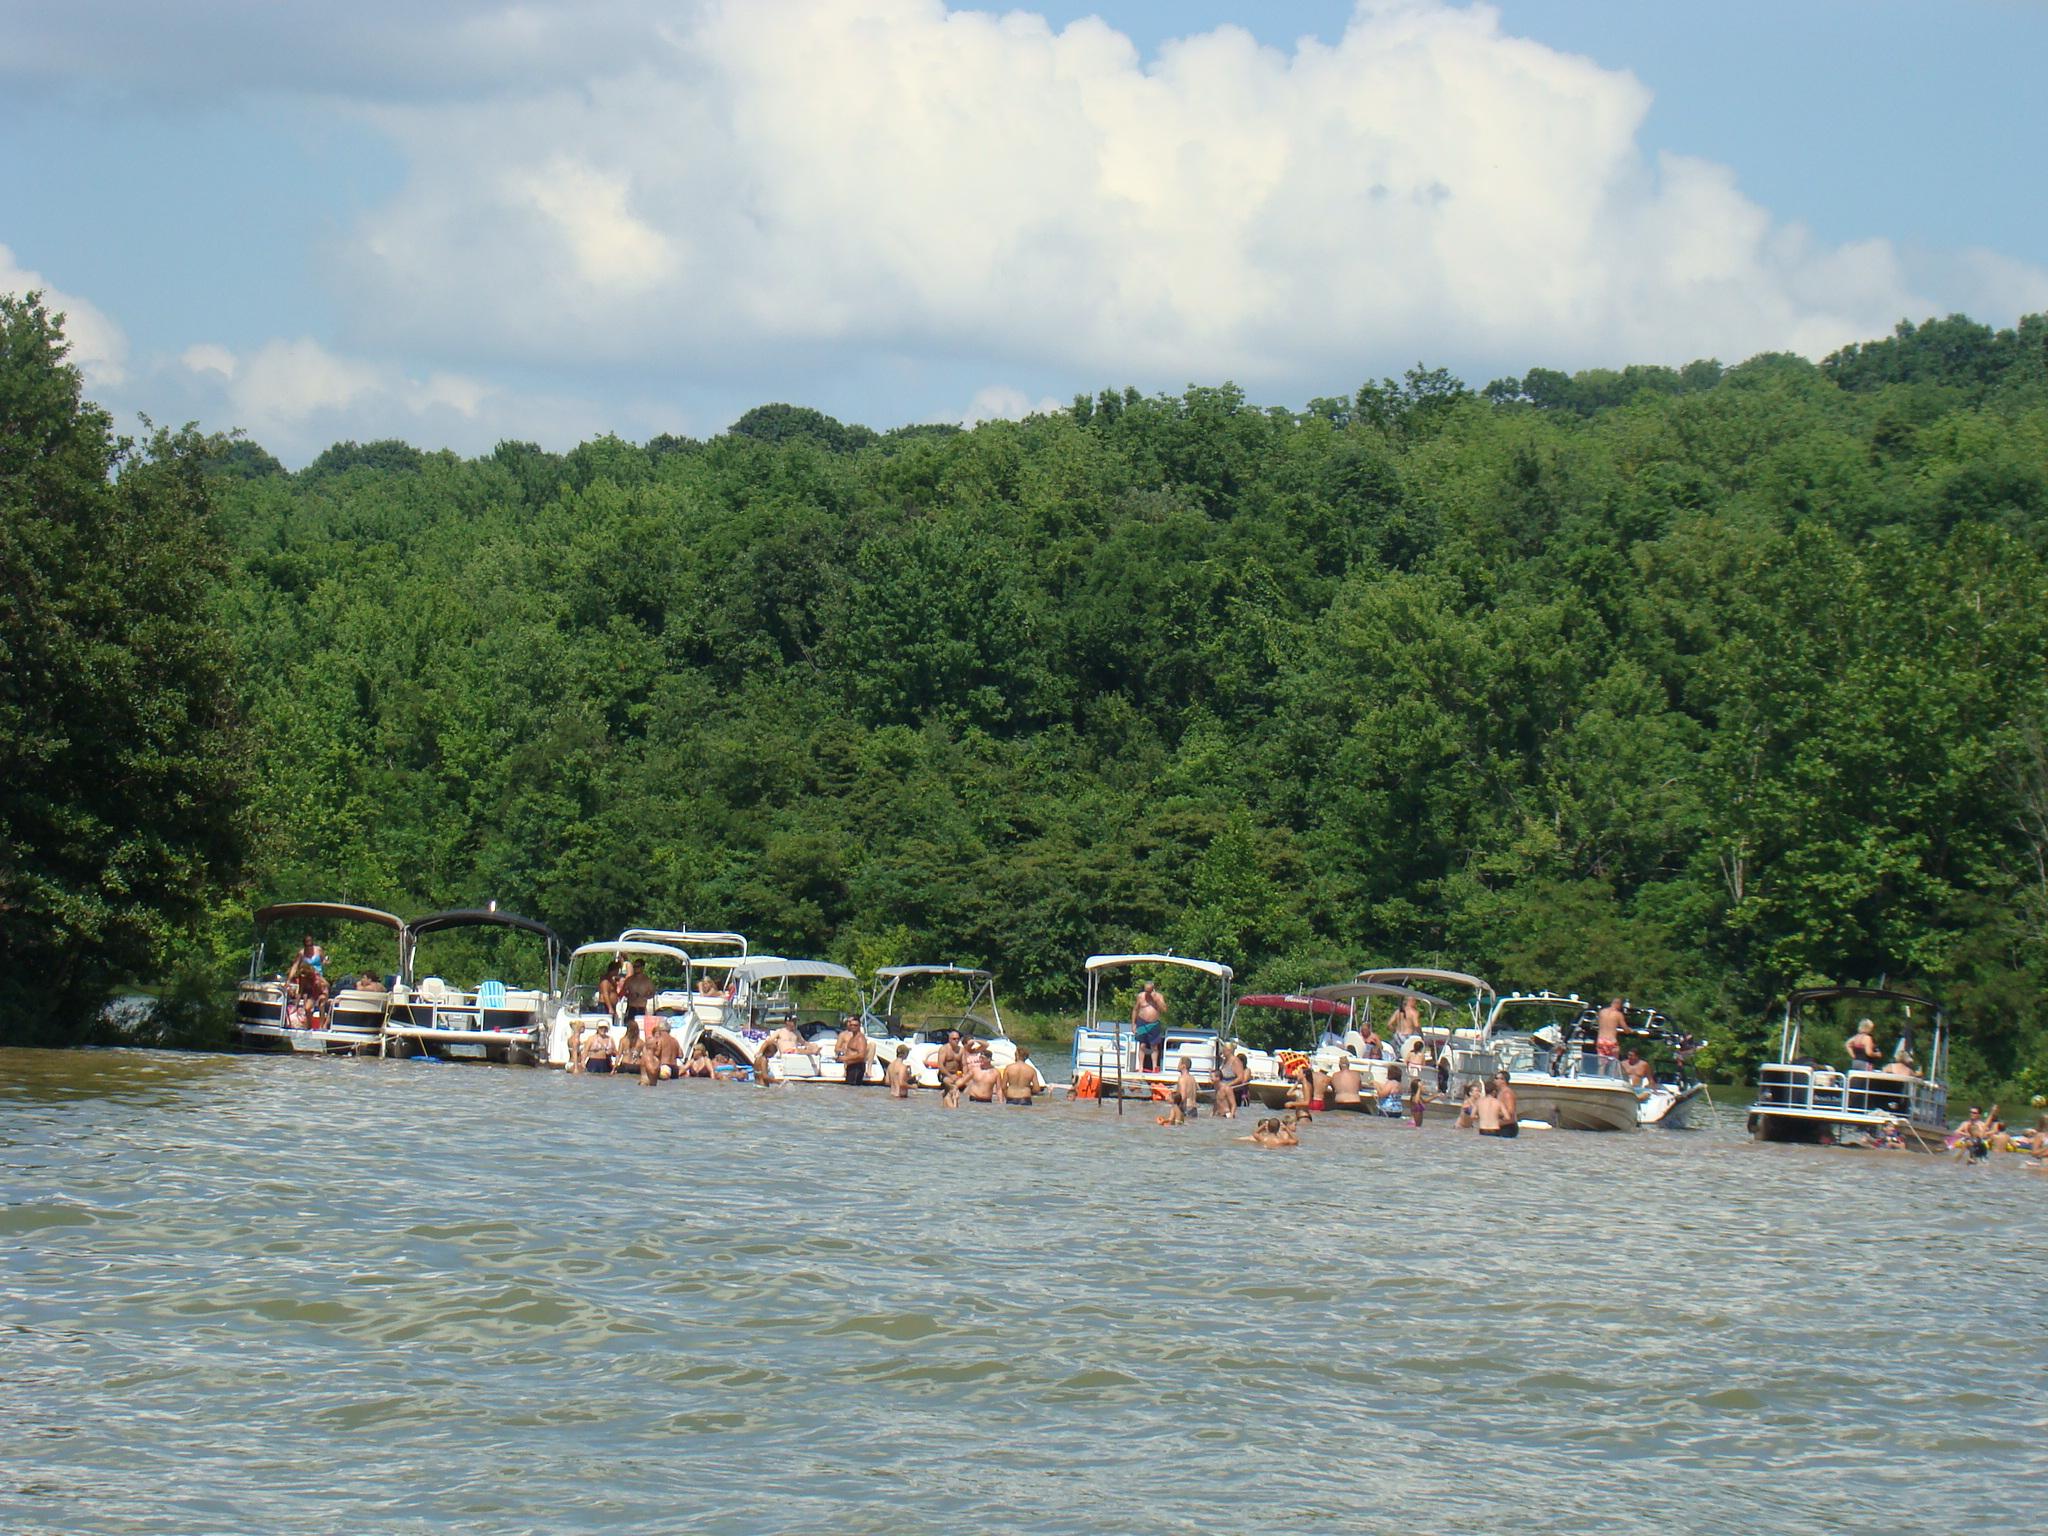 and lifts seneca boat lakes docks aqua cabins retouch stationary at lake we doc service aluminum ohio